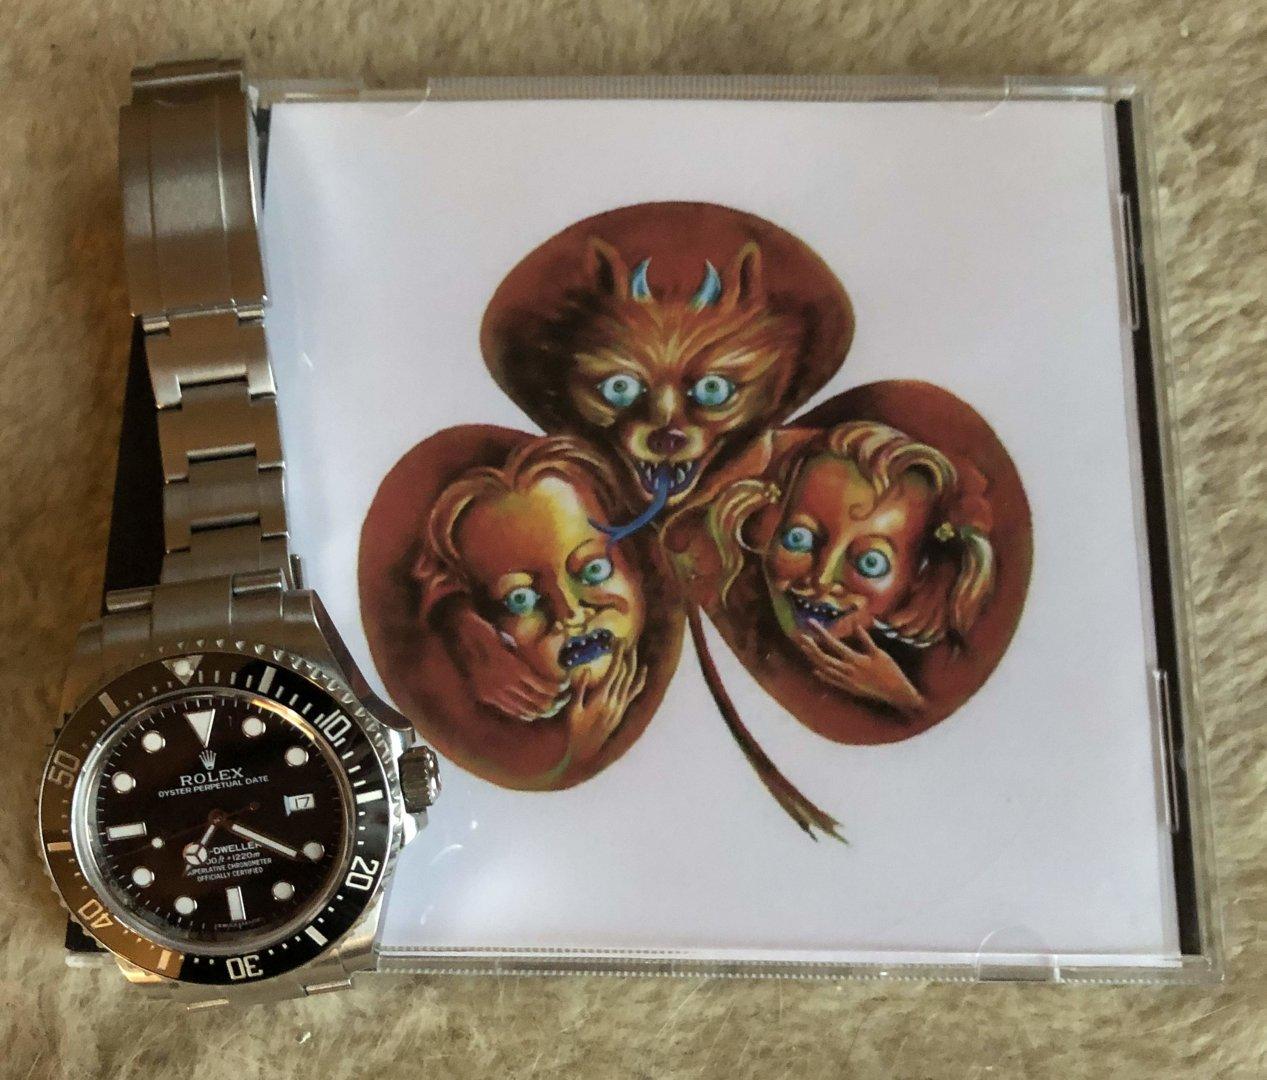 Rolex 2019-09-17 (CD).